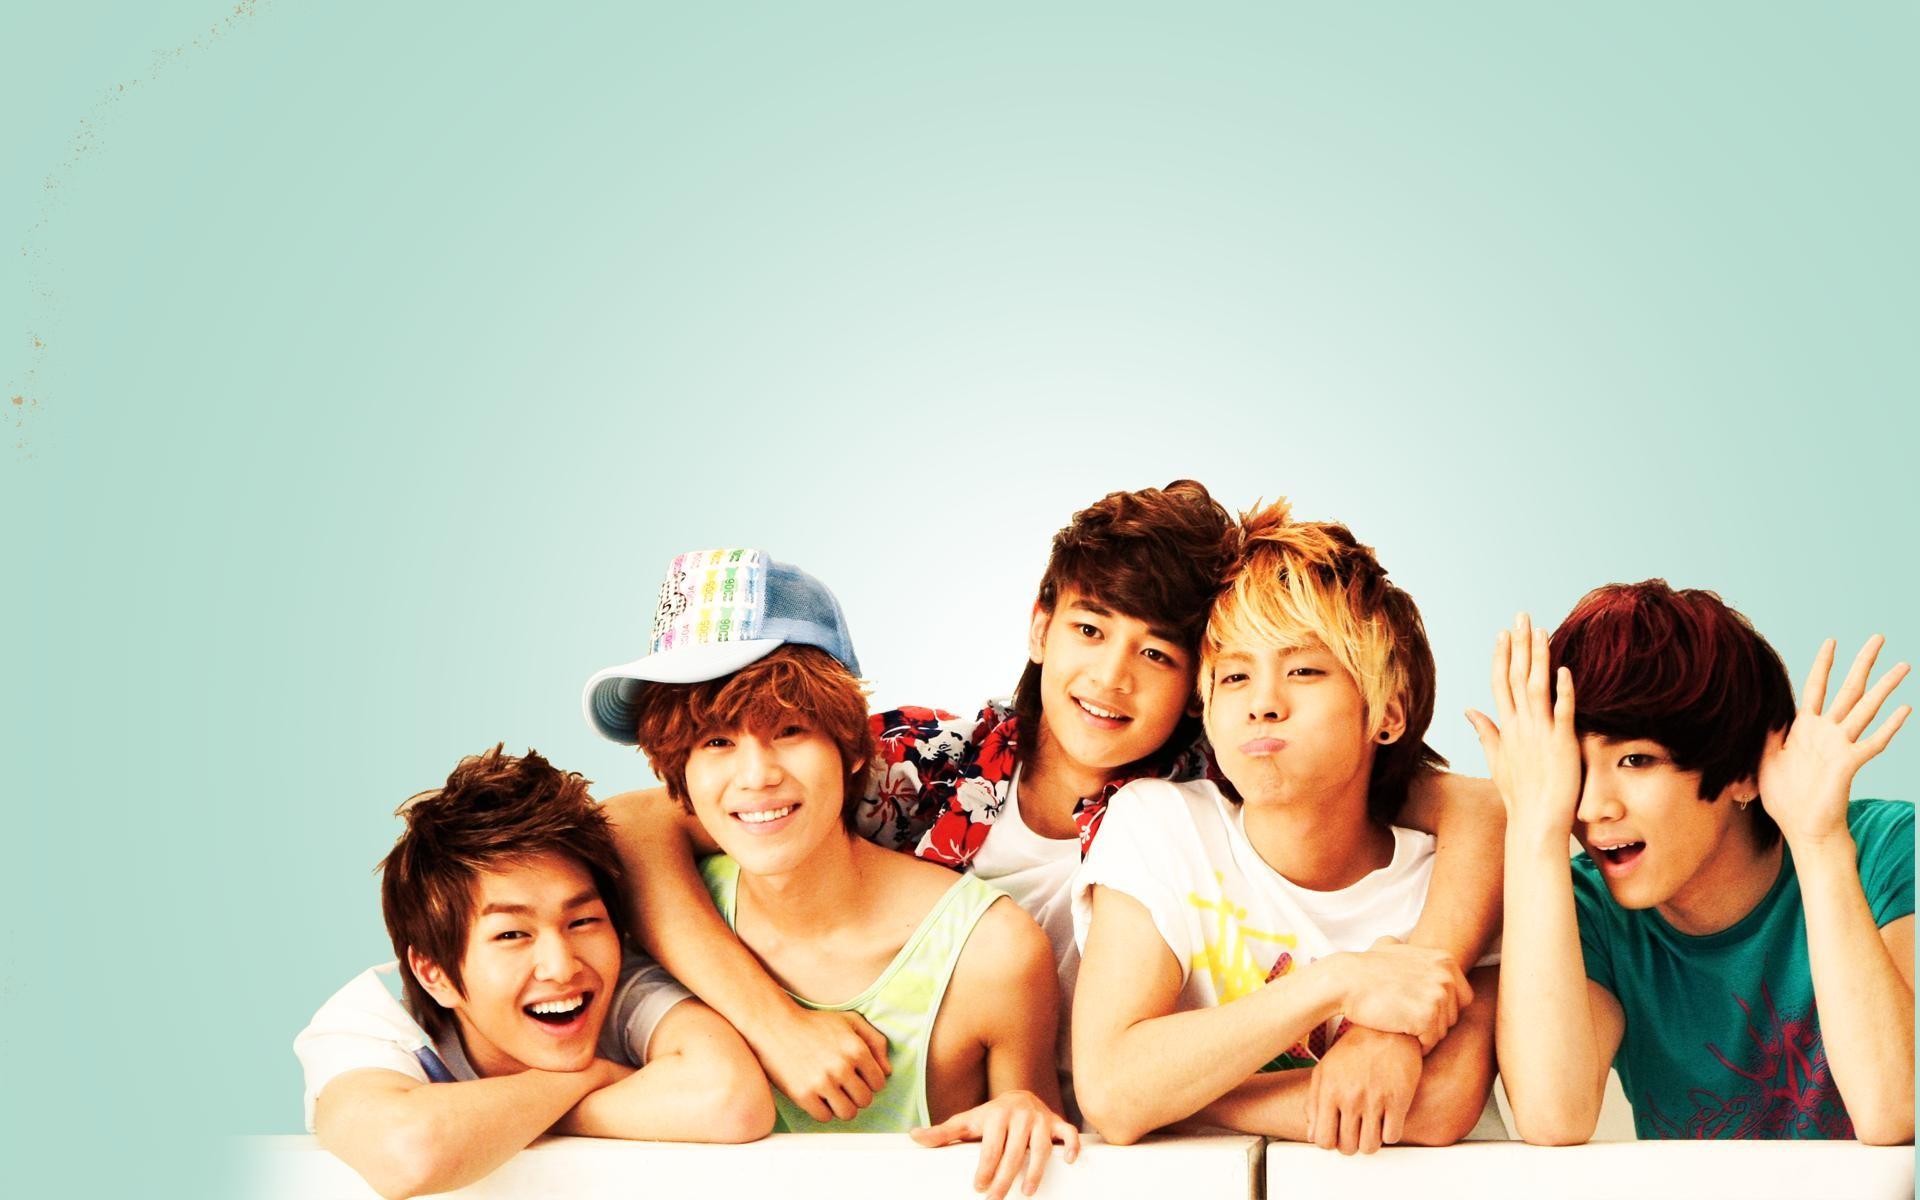 BTS desktop wallpaper ·① Download free stunning HD ...